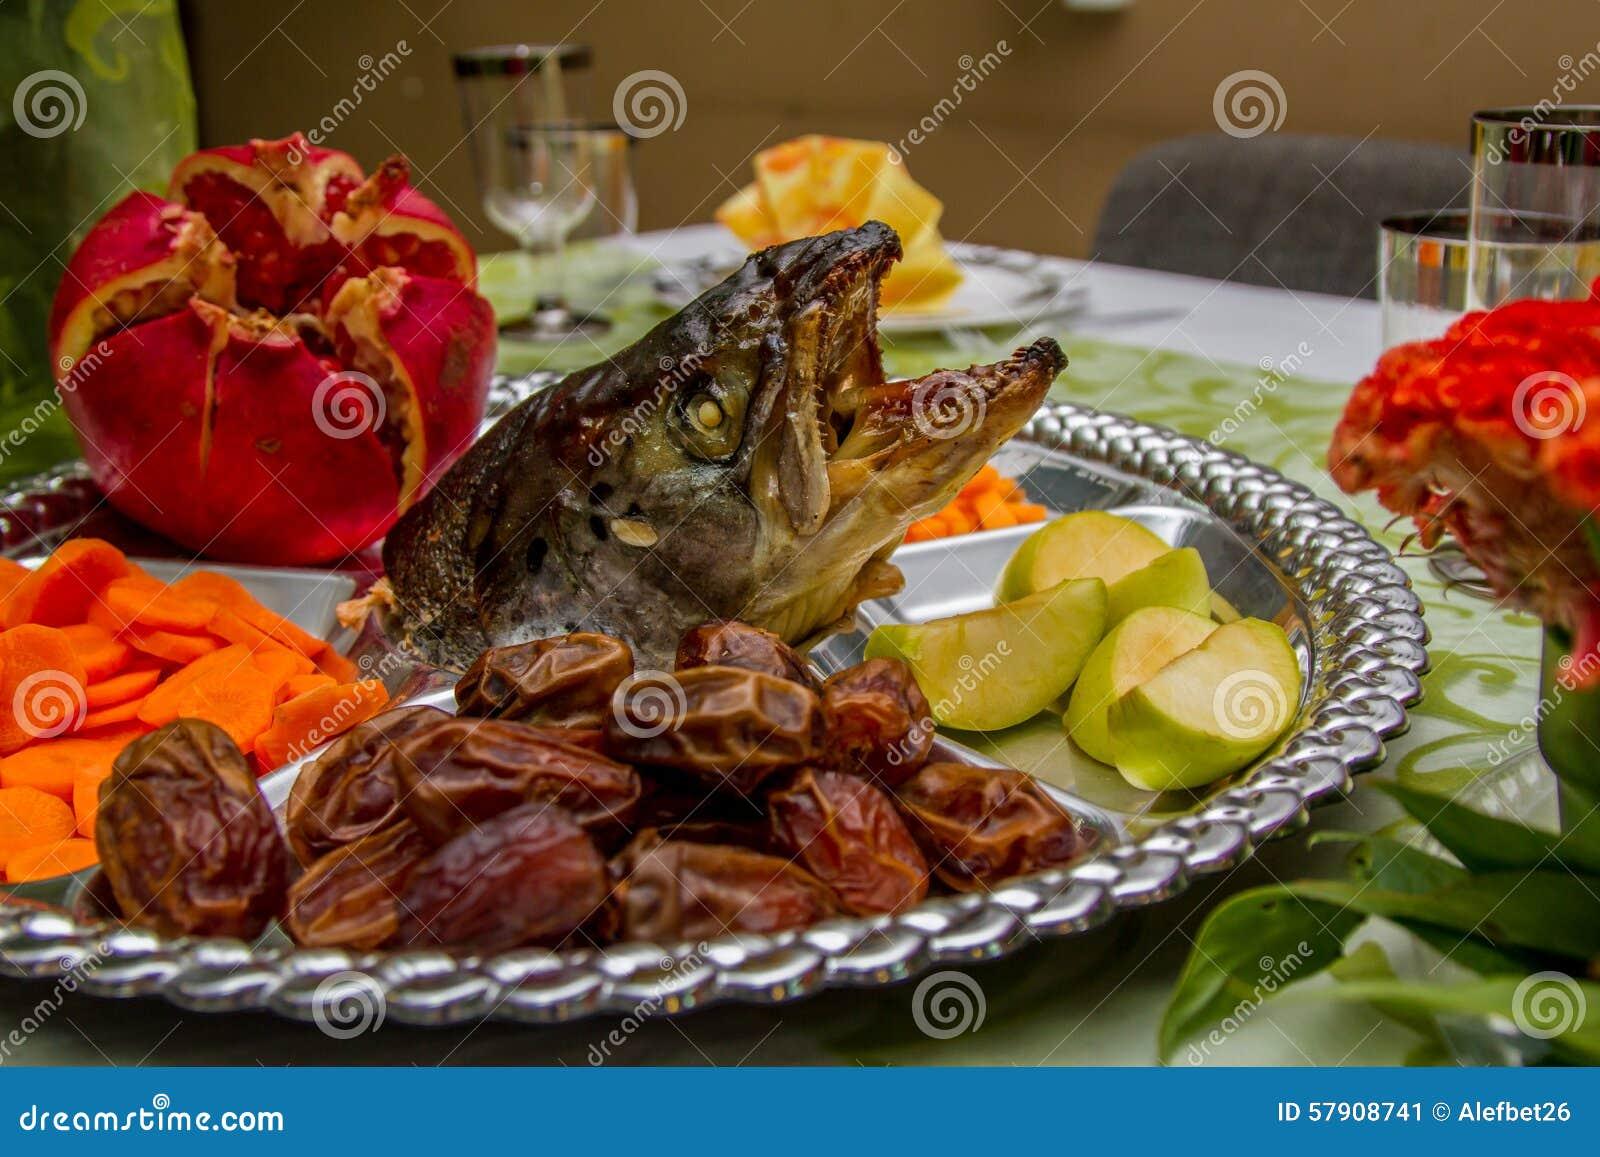 Jewish holidays rosh ha shana stock photo image 57908741 for Jewish fish dish